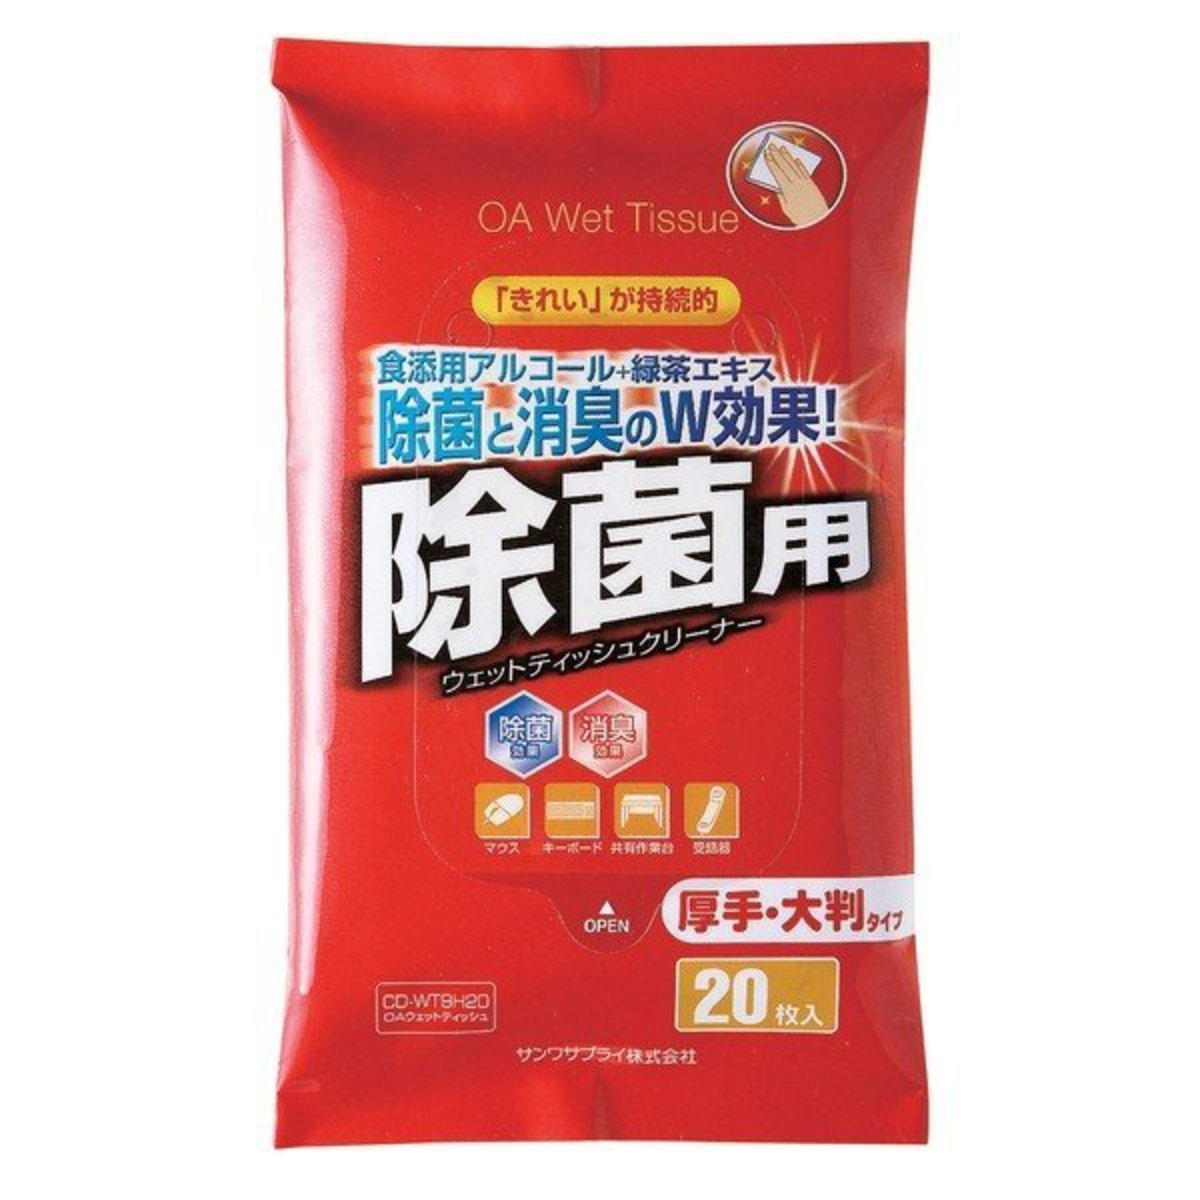 (Red Bag) Made in Japan Sanwa Big & Thick Disinfecting & Deodorizing Alcohol Wipes (20pcs) x 1 Bag